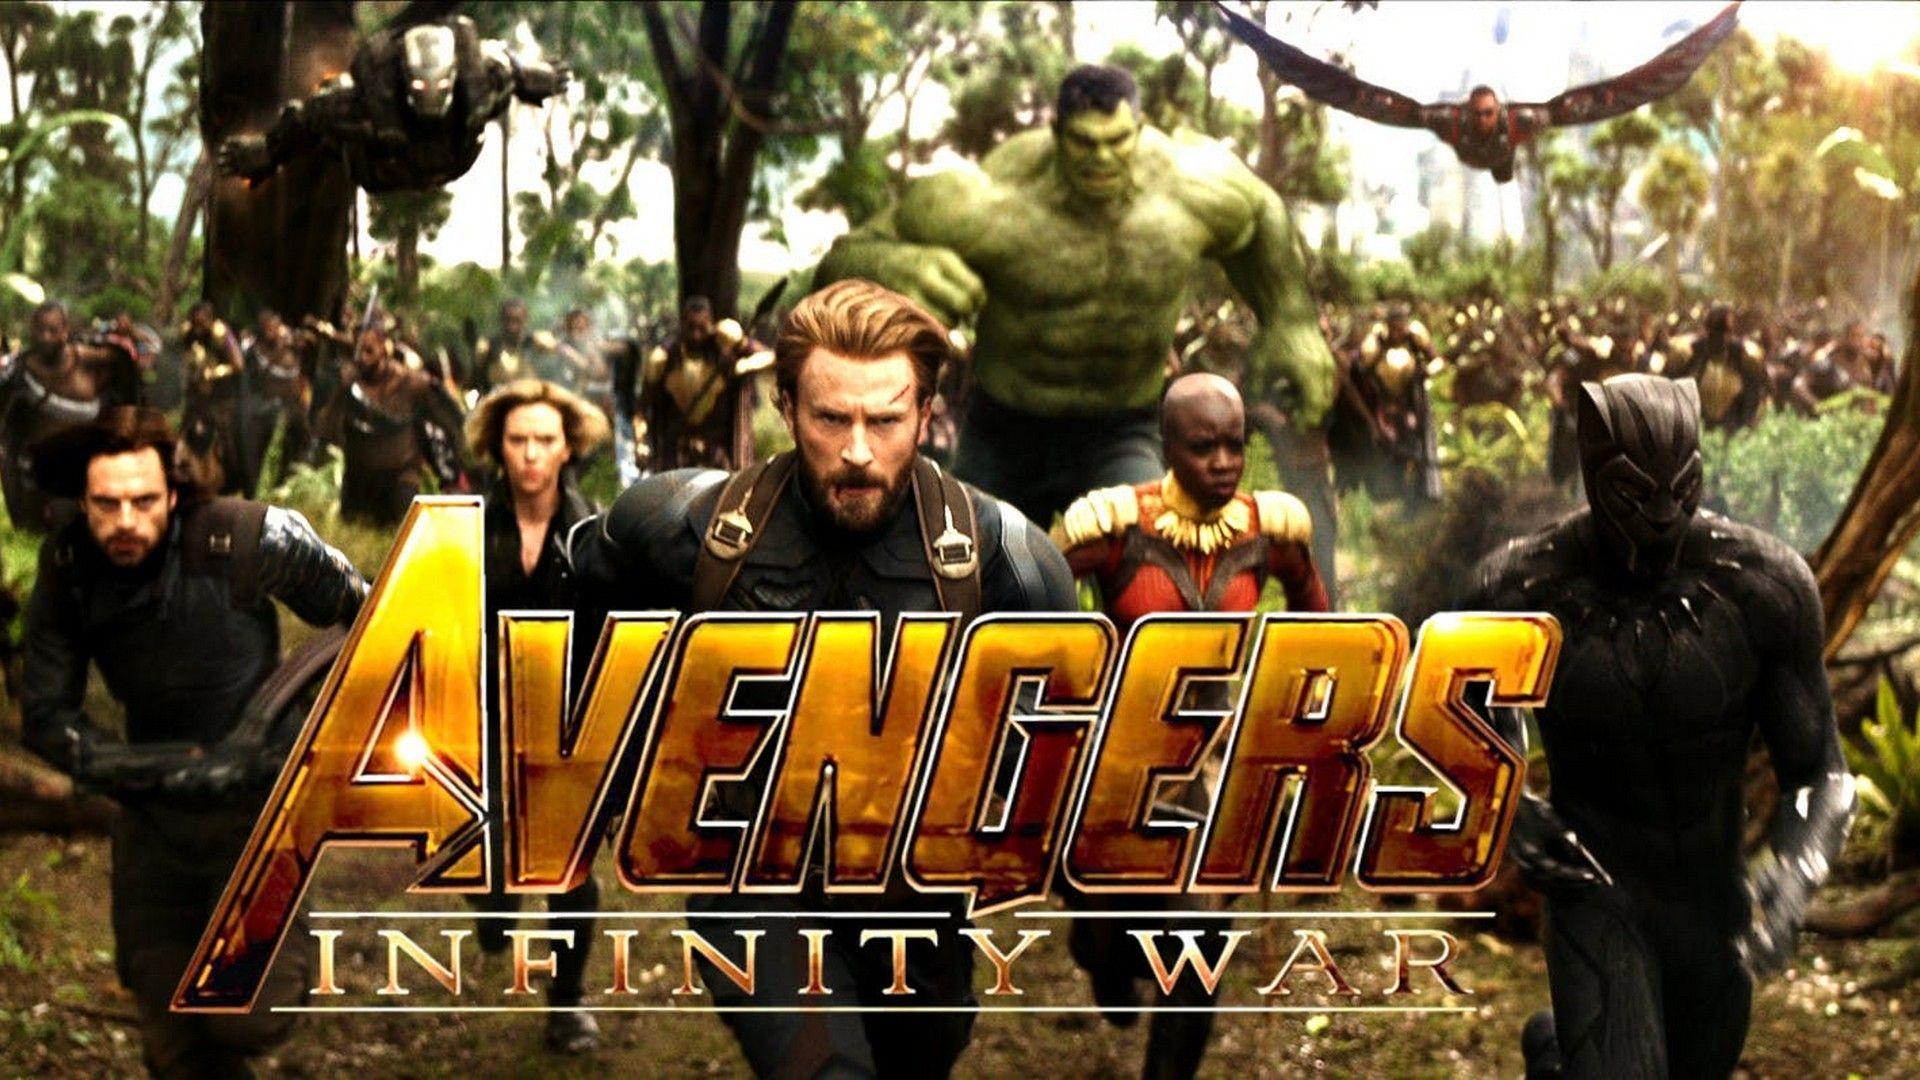 Avengers 3 Desktop Backgrounds Hd Best Hd Wallpapers Desktop